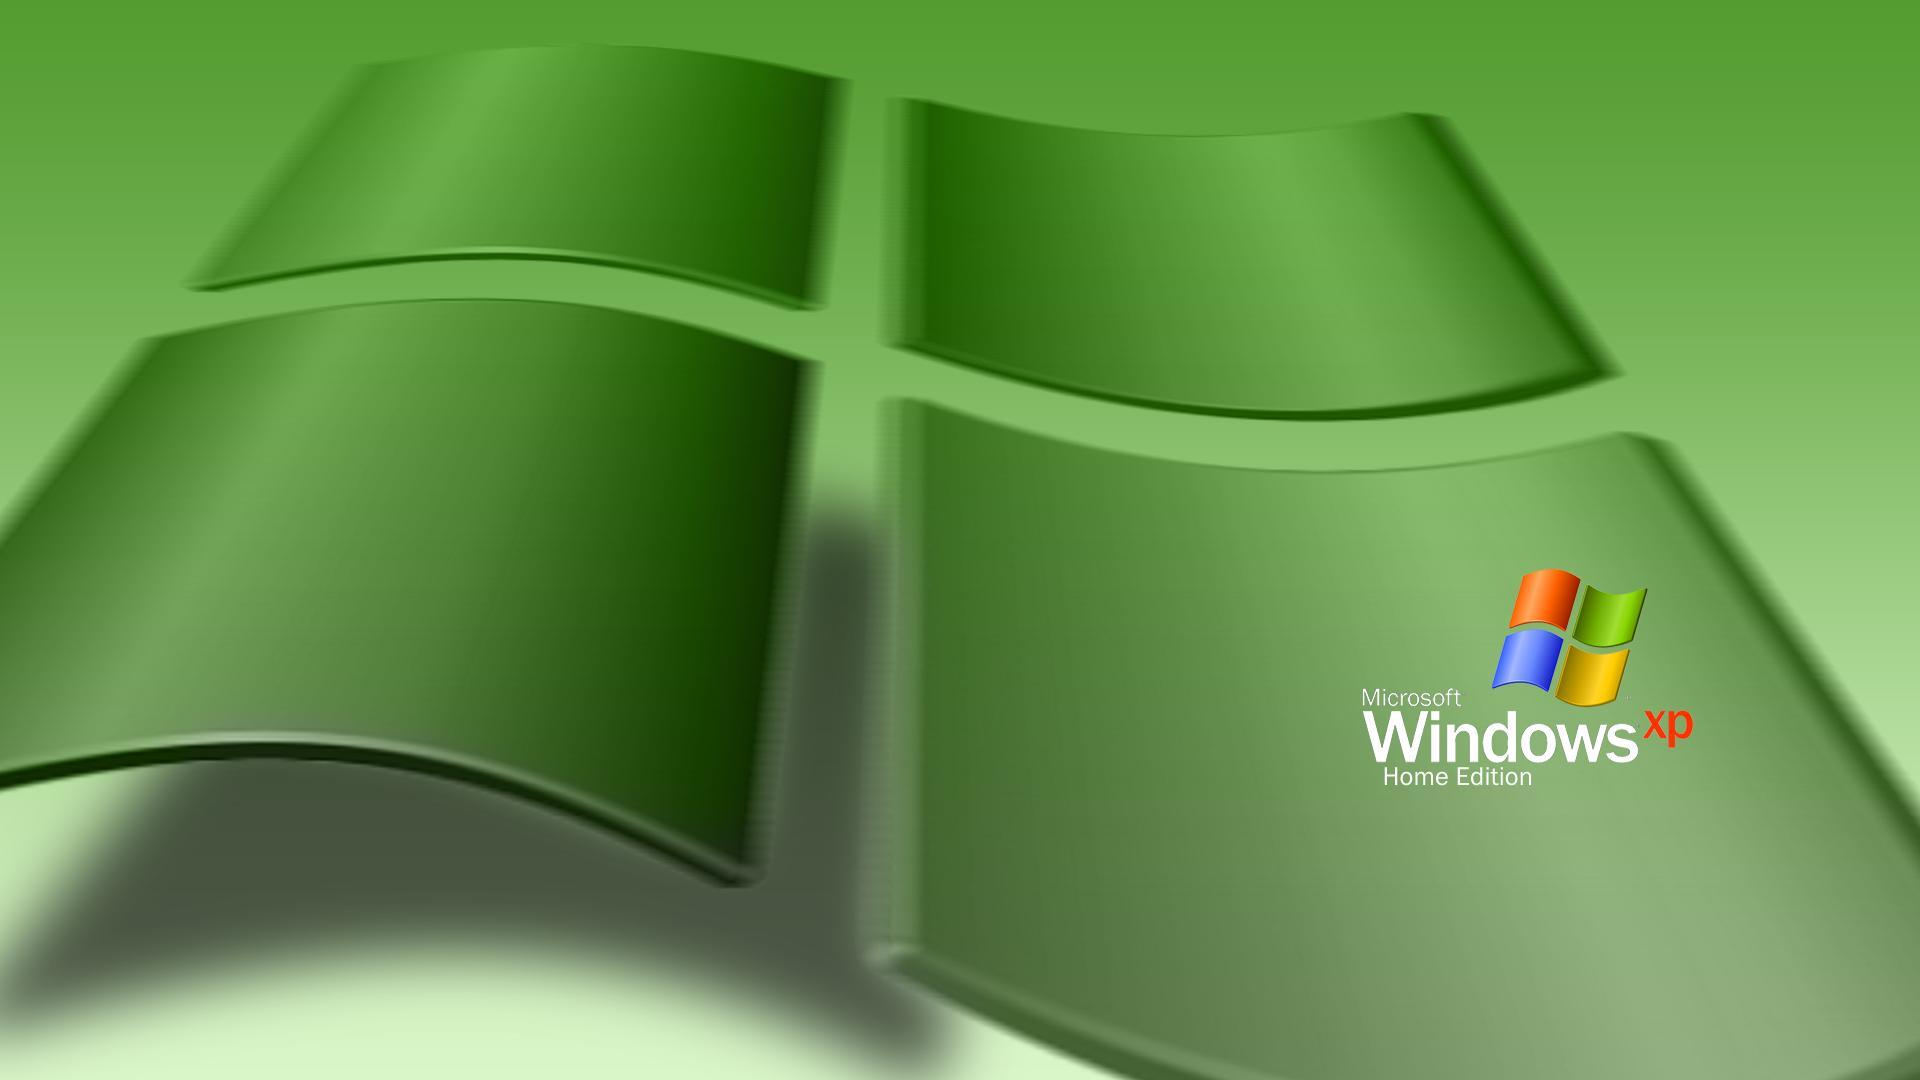 Windows xp home edition sp 3 32 bit apps directories, update.